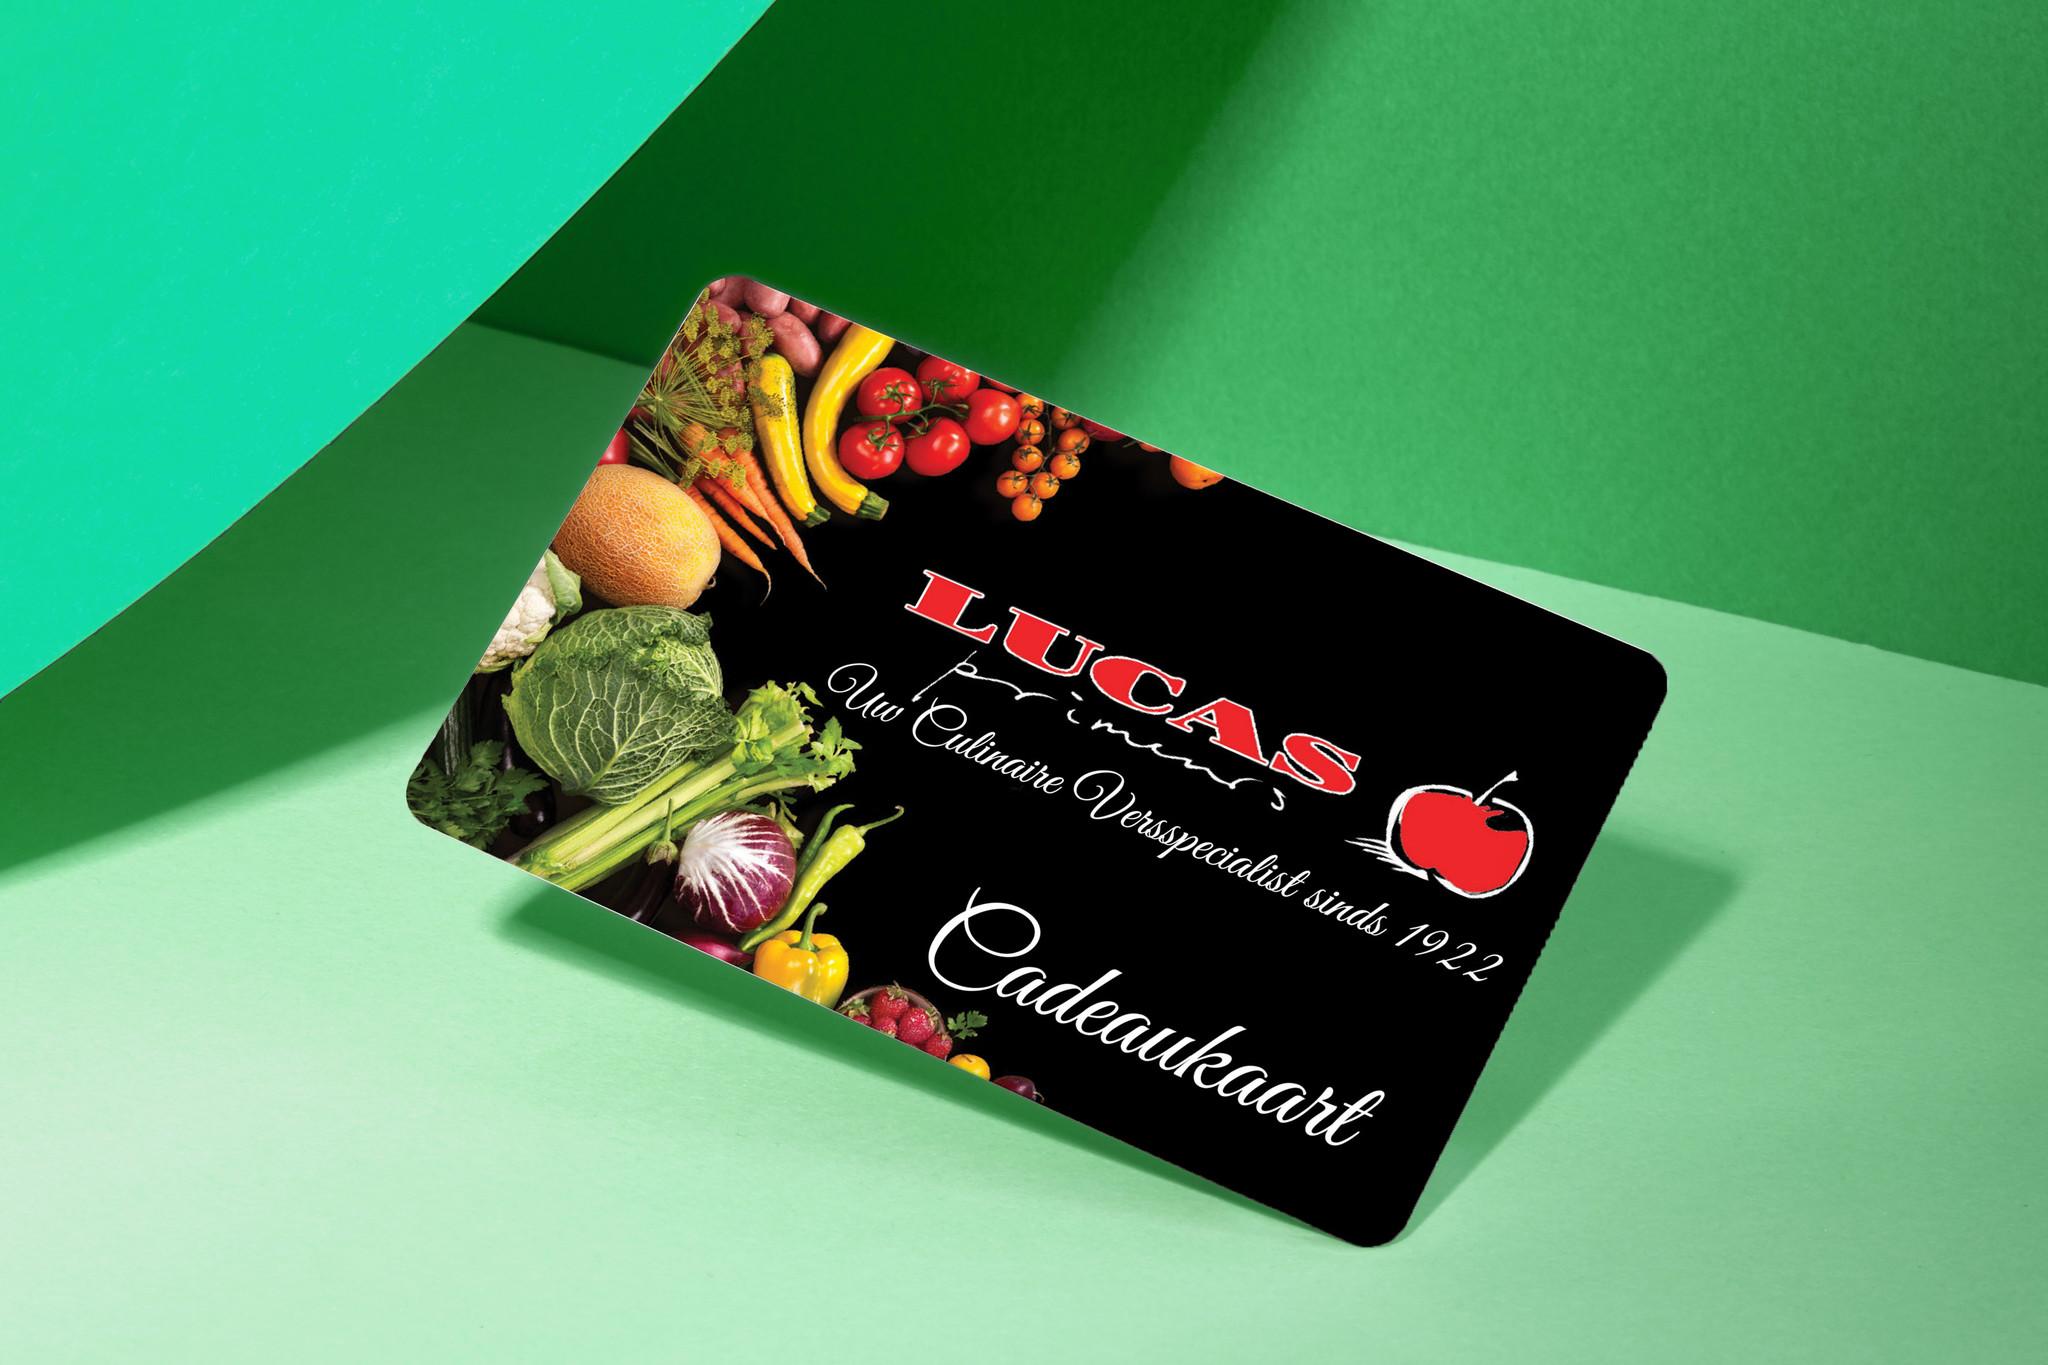 Groente en Fruithandel Lucas Primeurs-2